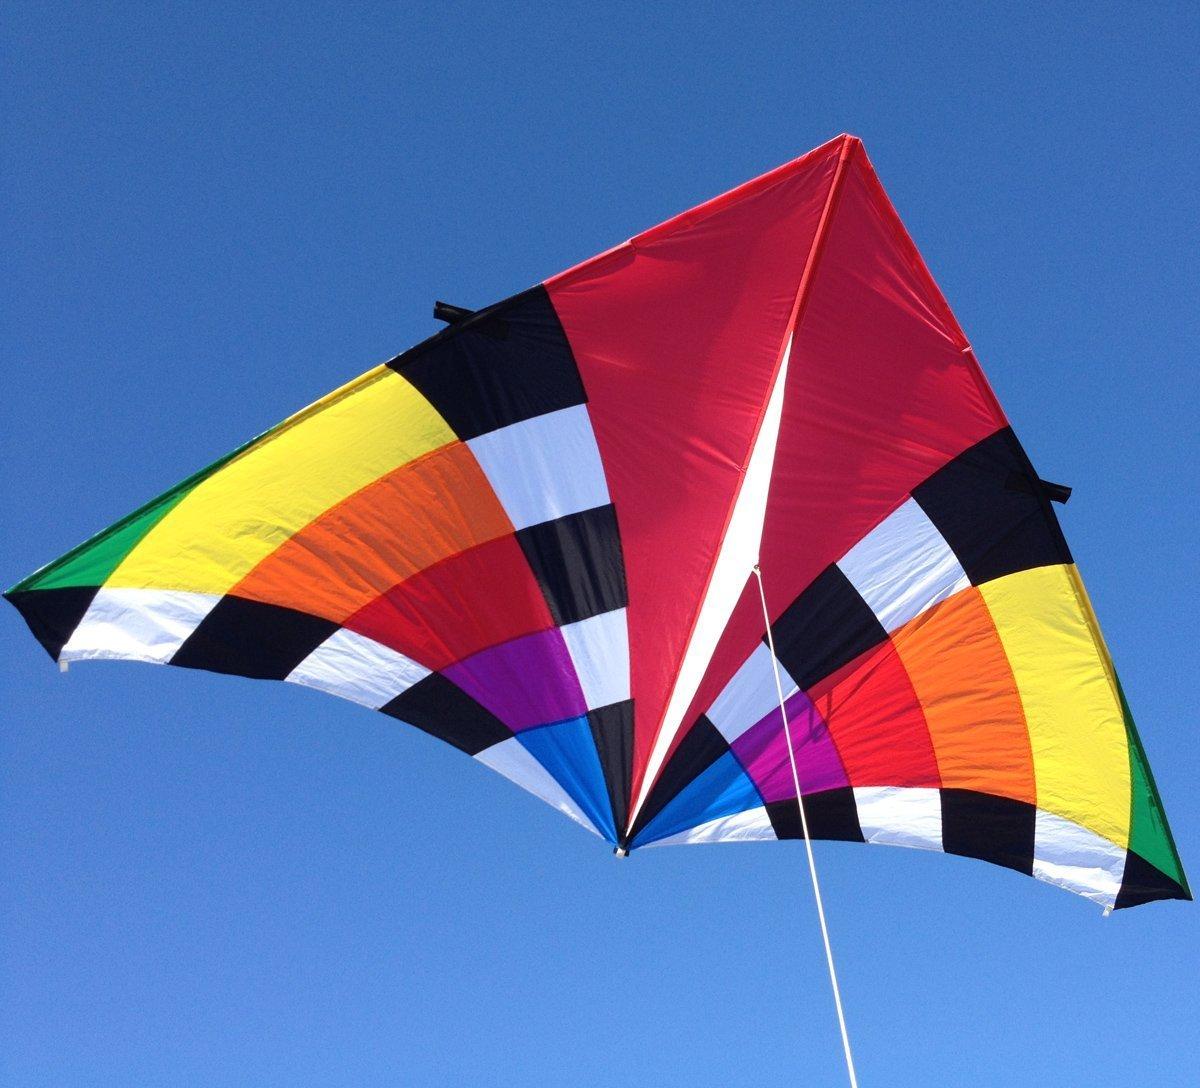 delta kite assembly instructions